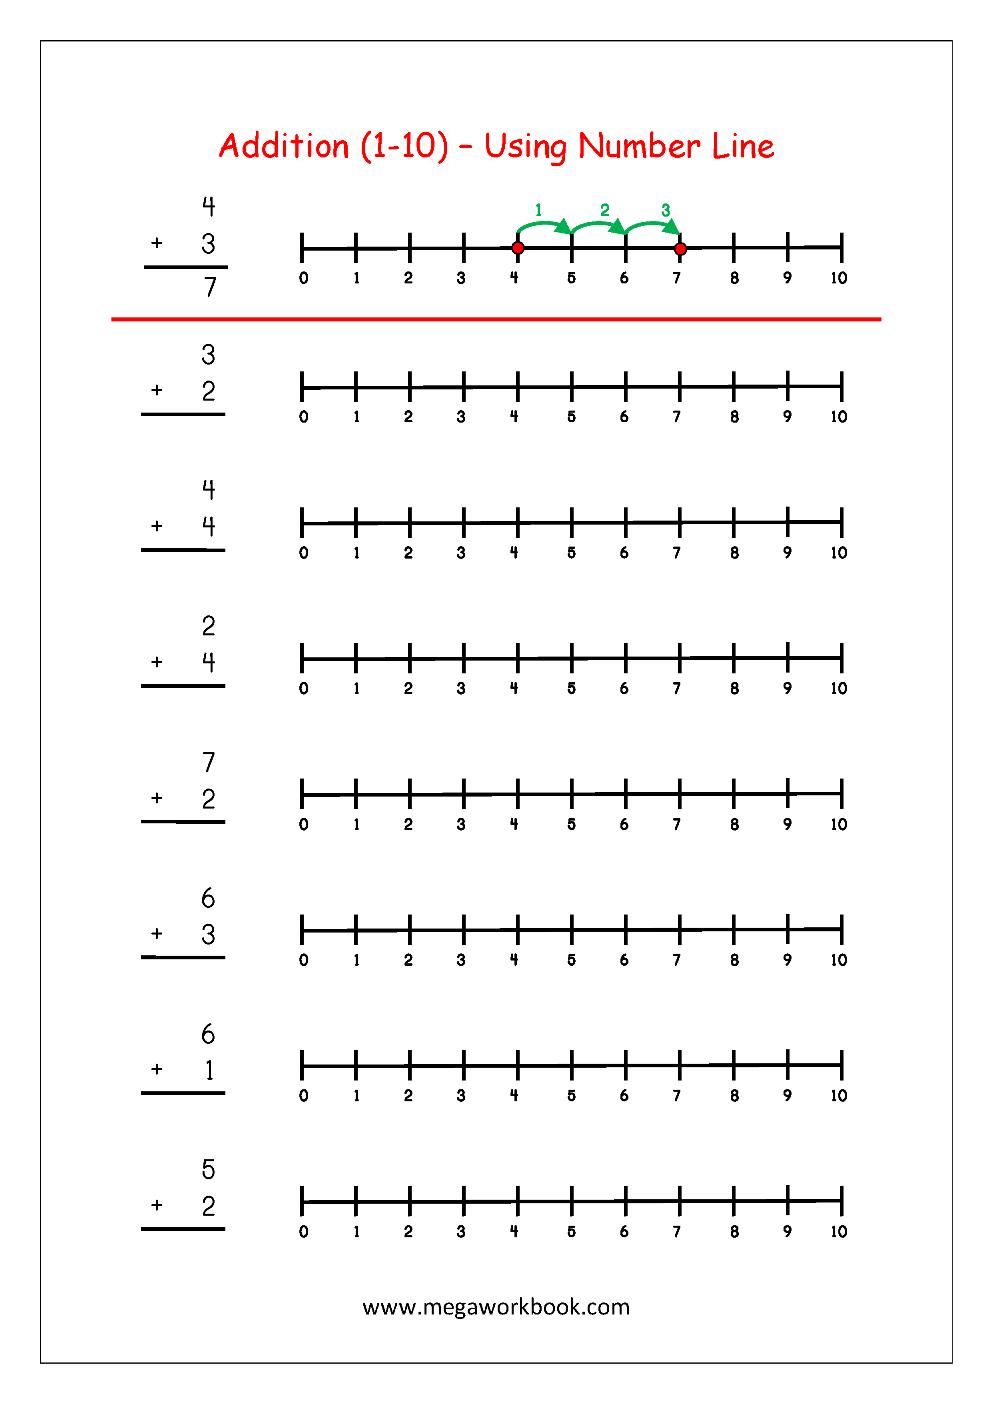 Free Printable Number Addition Worksheets (1-10) For Kindergarten   Free Printable Math Worksheets For Grade 1